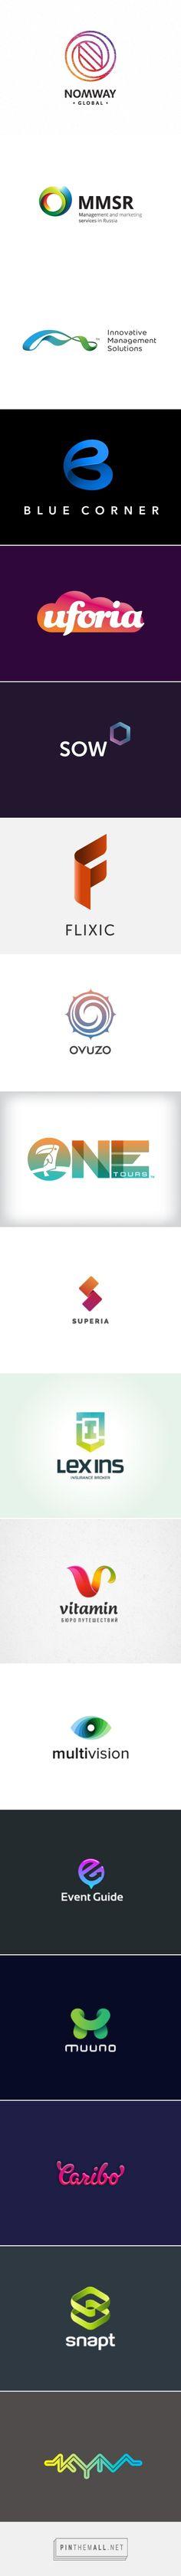 Logo Design: Gradients   Abduzeedo Design Inspiration - created via http://pinthemall.net